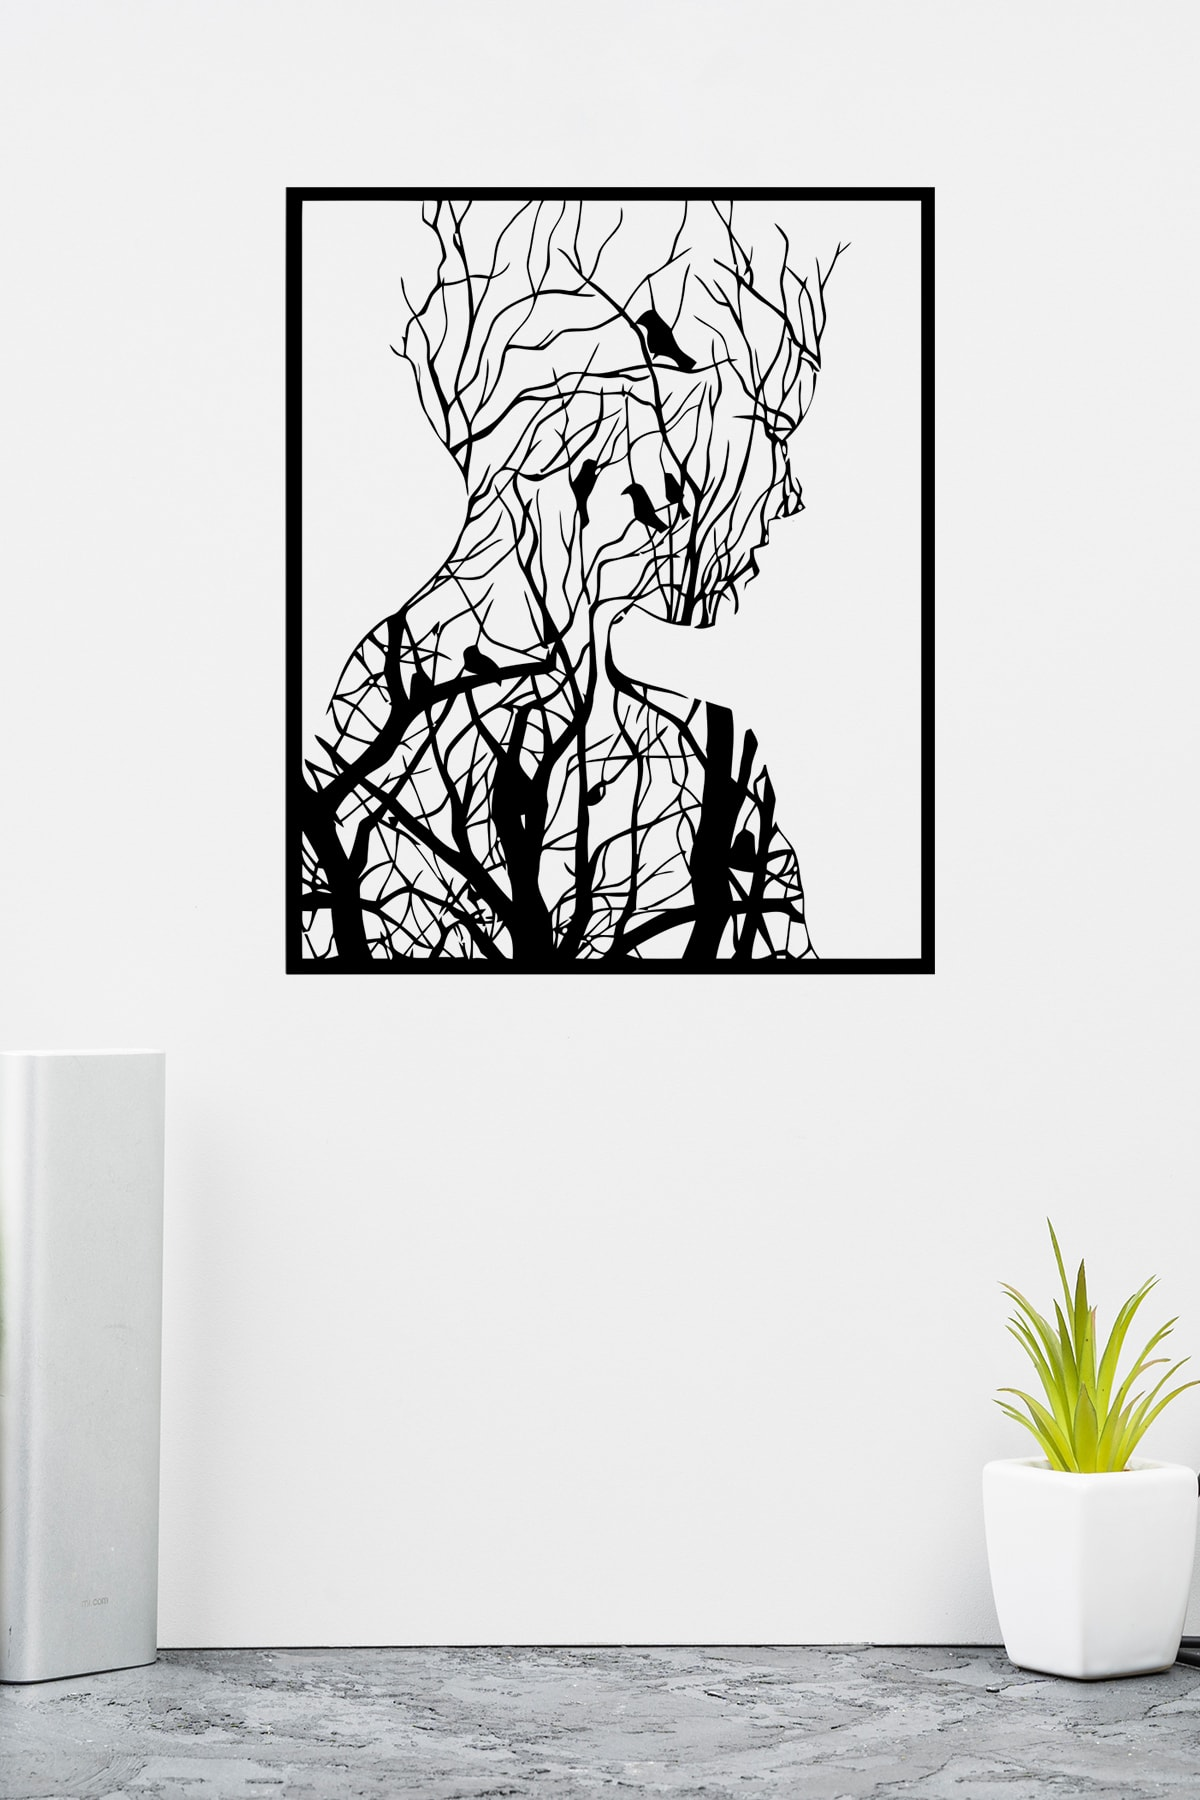 PAYİDARTS Ormandan Doğan Kadın Lazer Kesim Metal Duvar Tablo 70x87cm 2